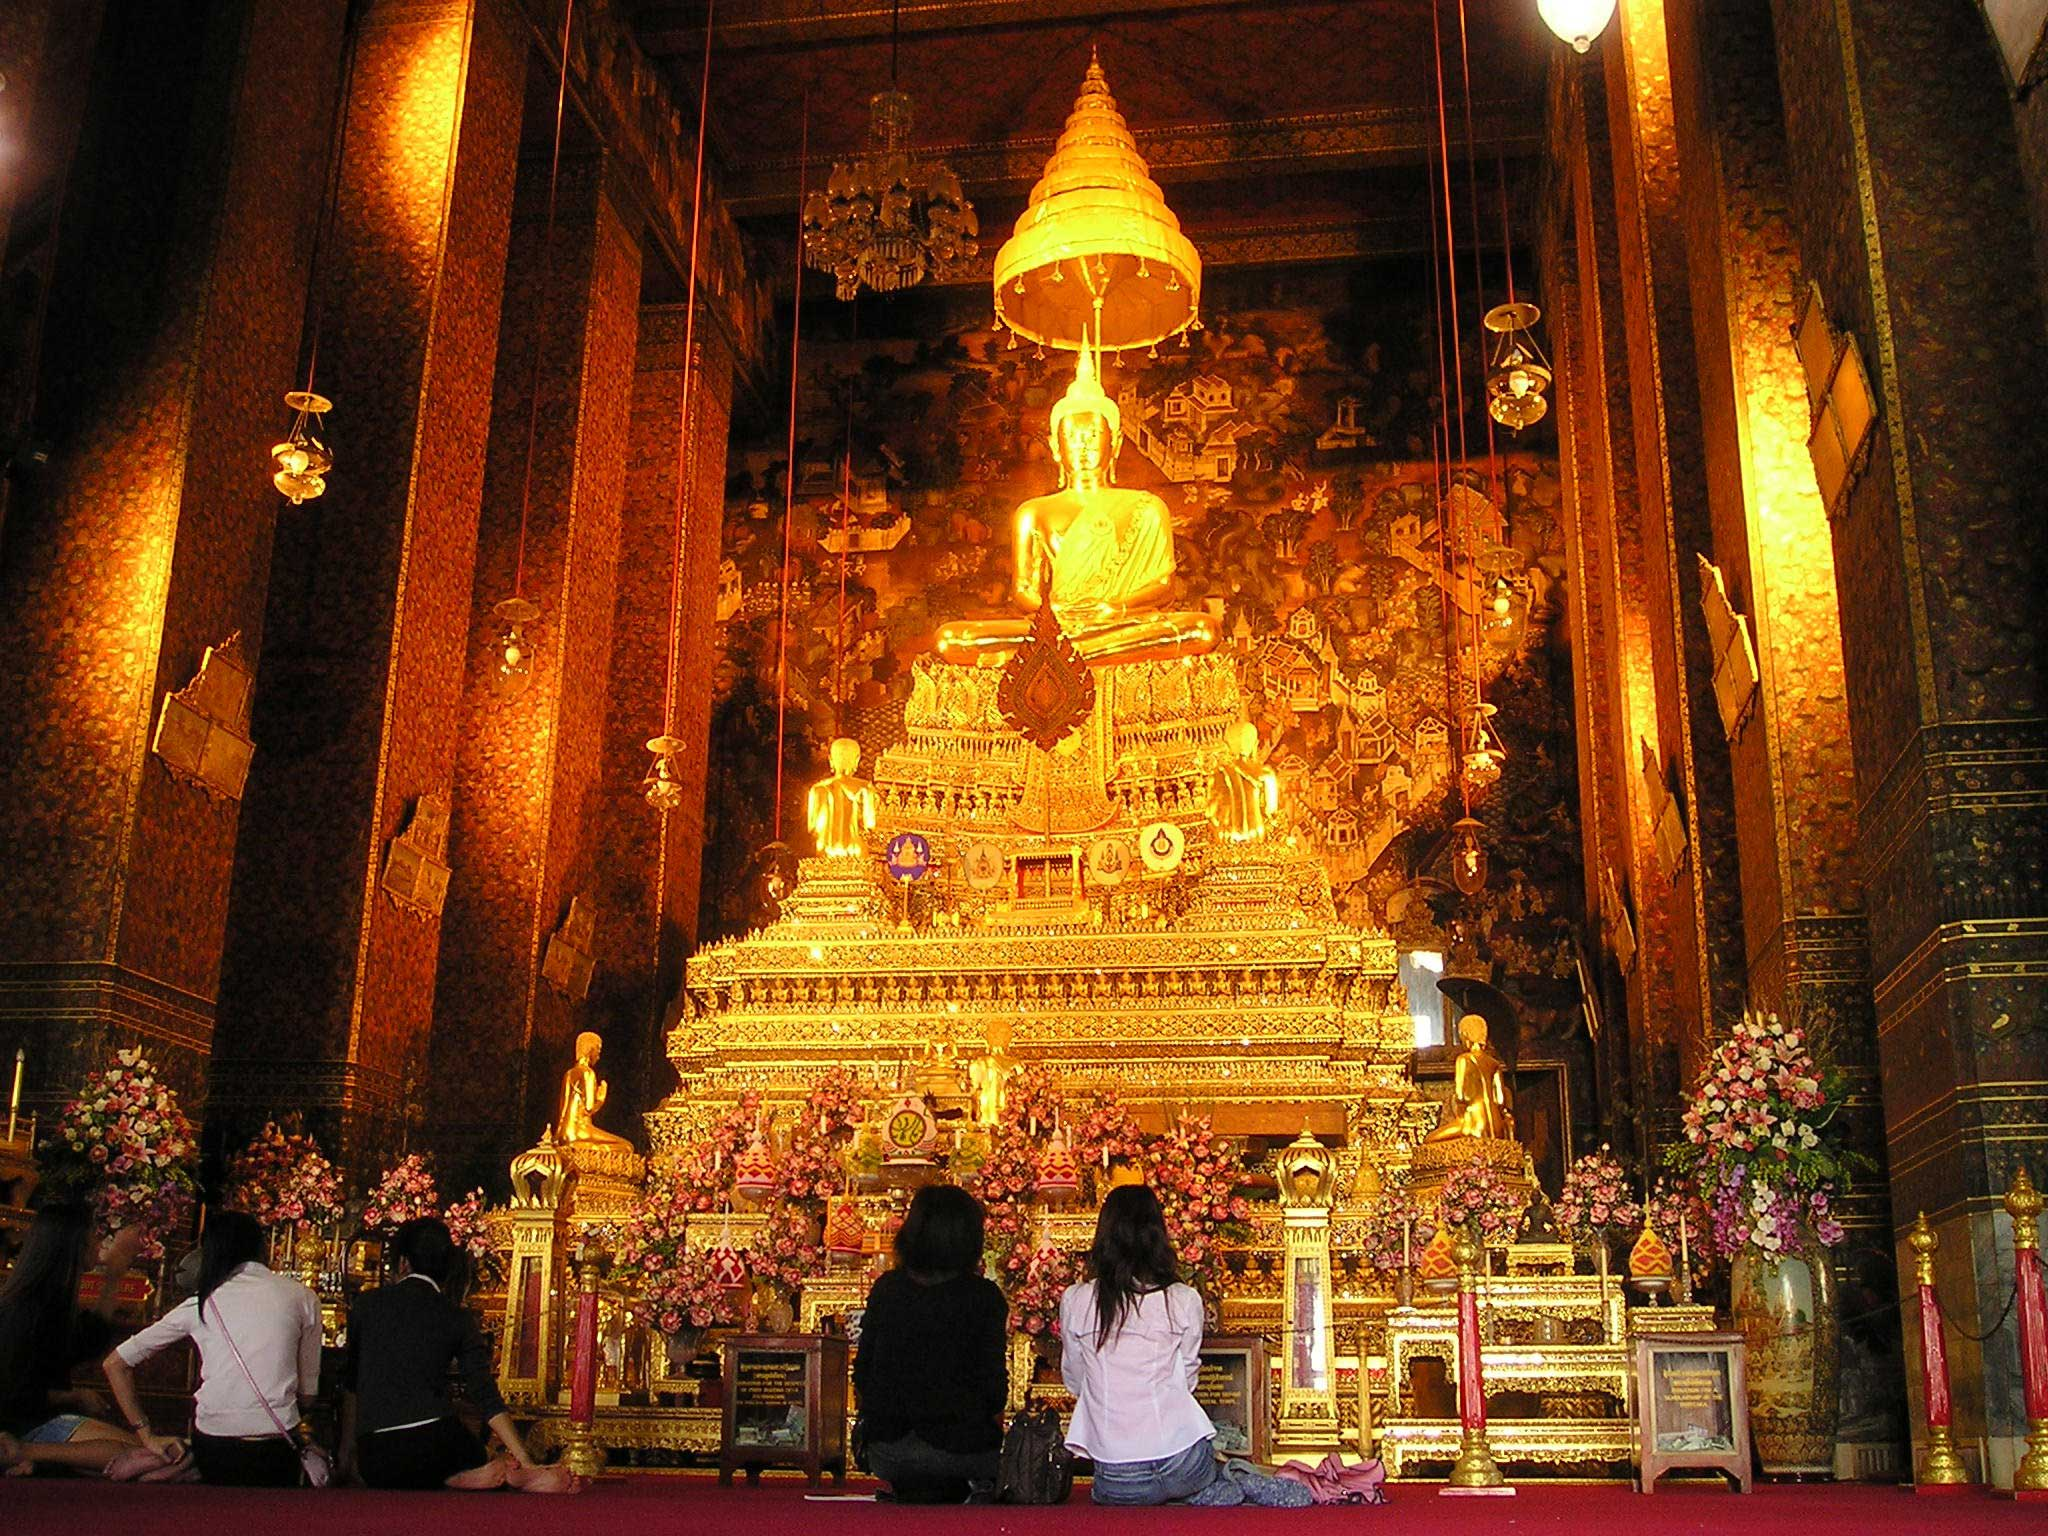 A golden shrine to the Buddha in Bangkok, Thailand.